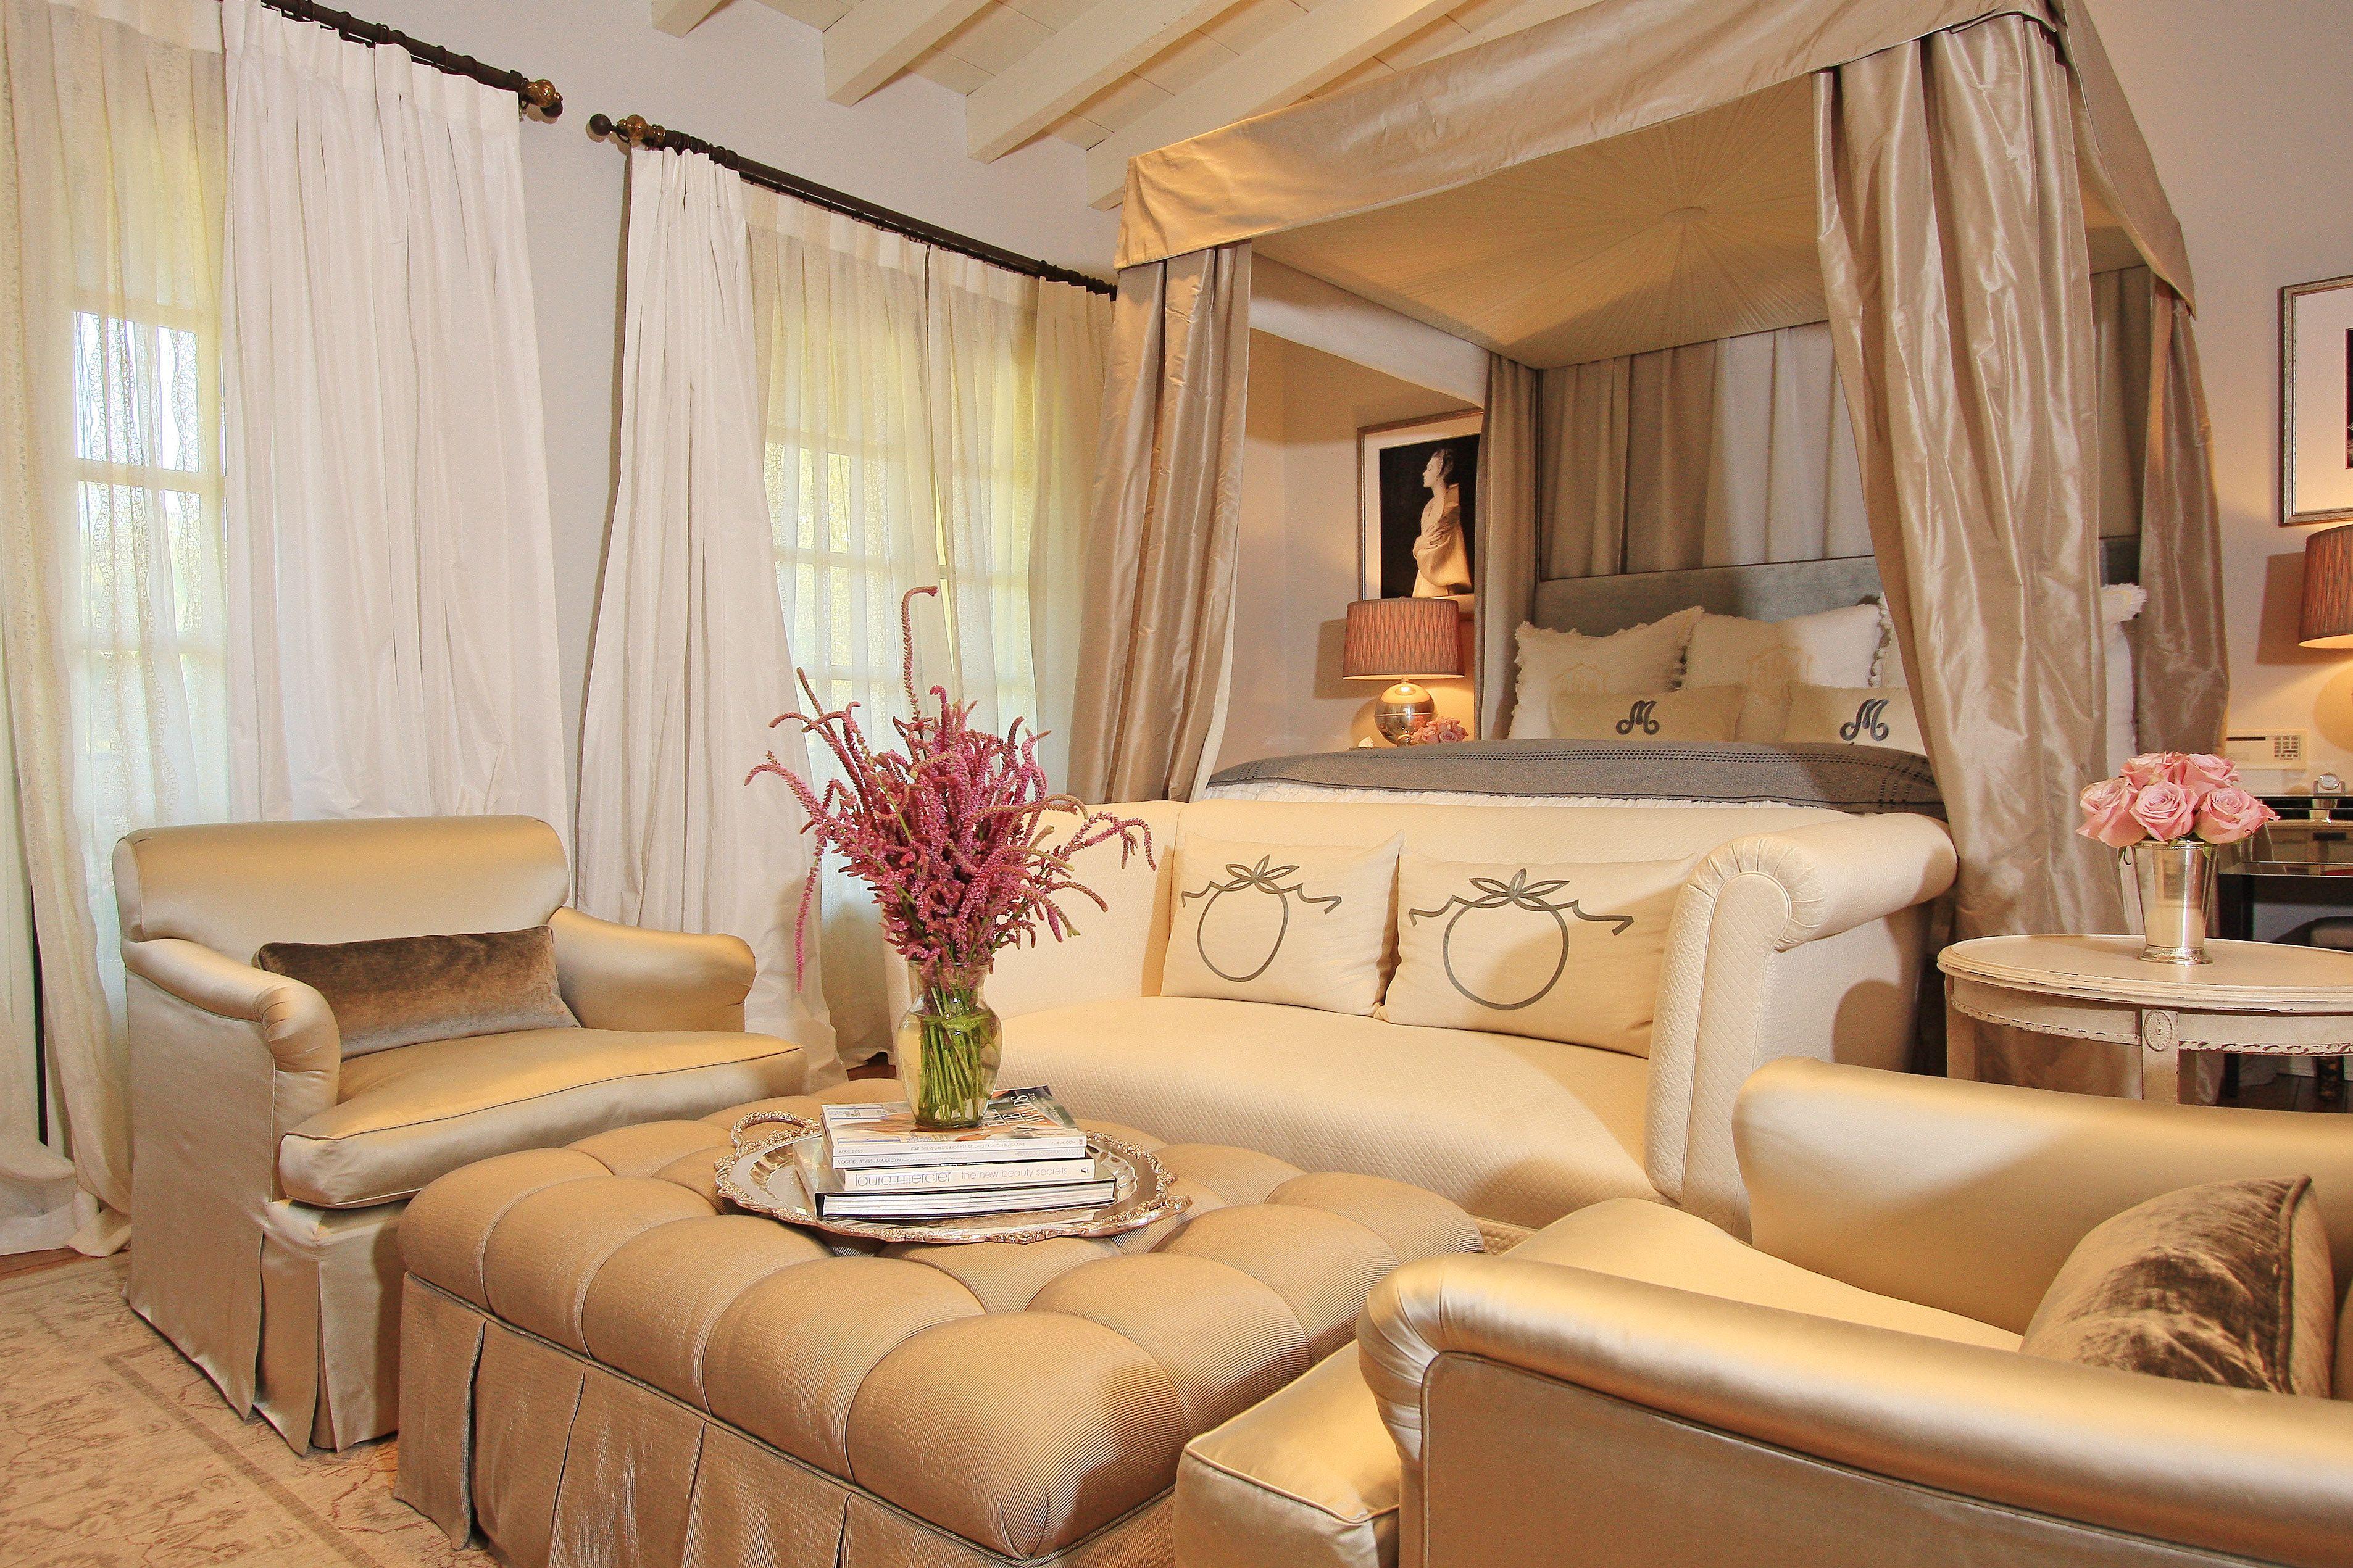 Elegant Bedrooms Pleasing Master Bedroom  Bedrooms  Pinterest  Master Bedroom Bedrooms Design Decoration